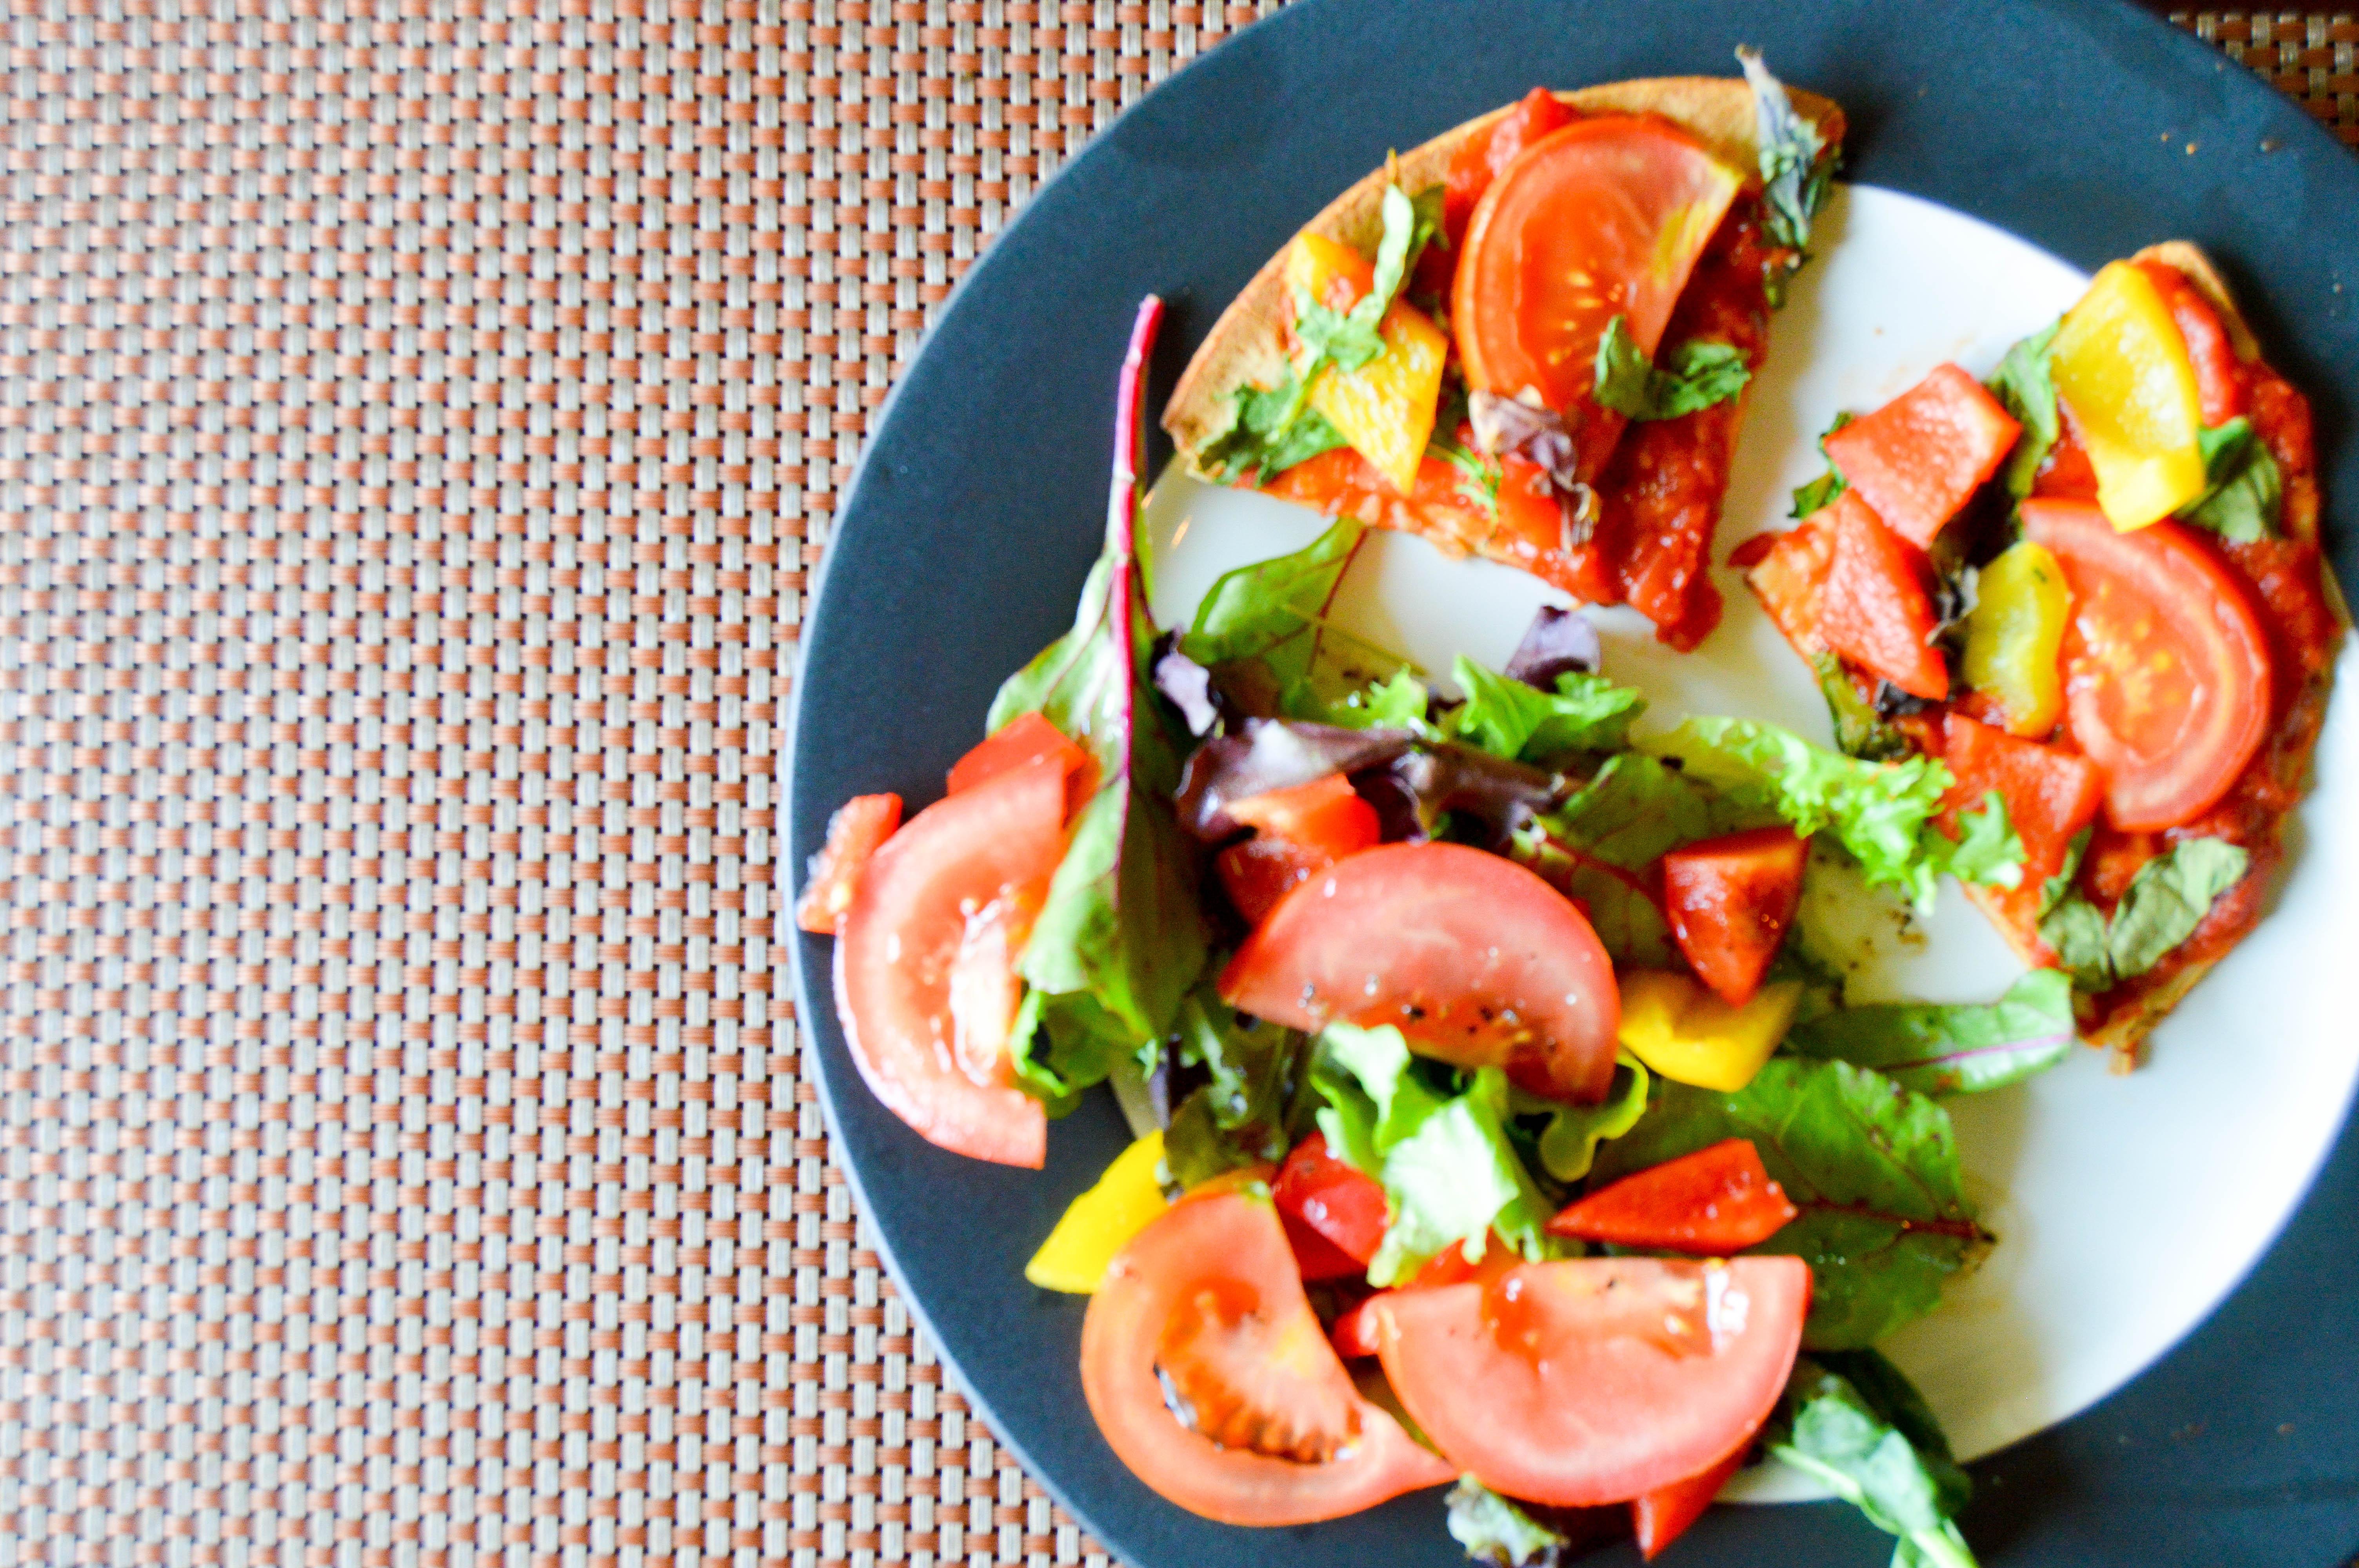 veggie pizza recipe, healthy lunch ideas